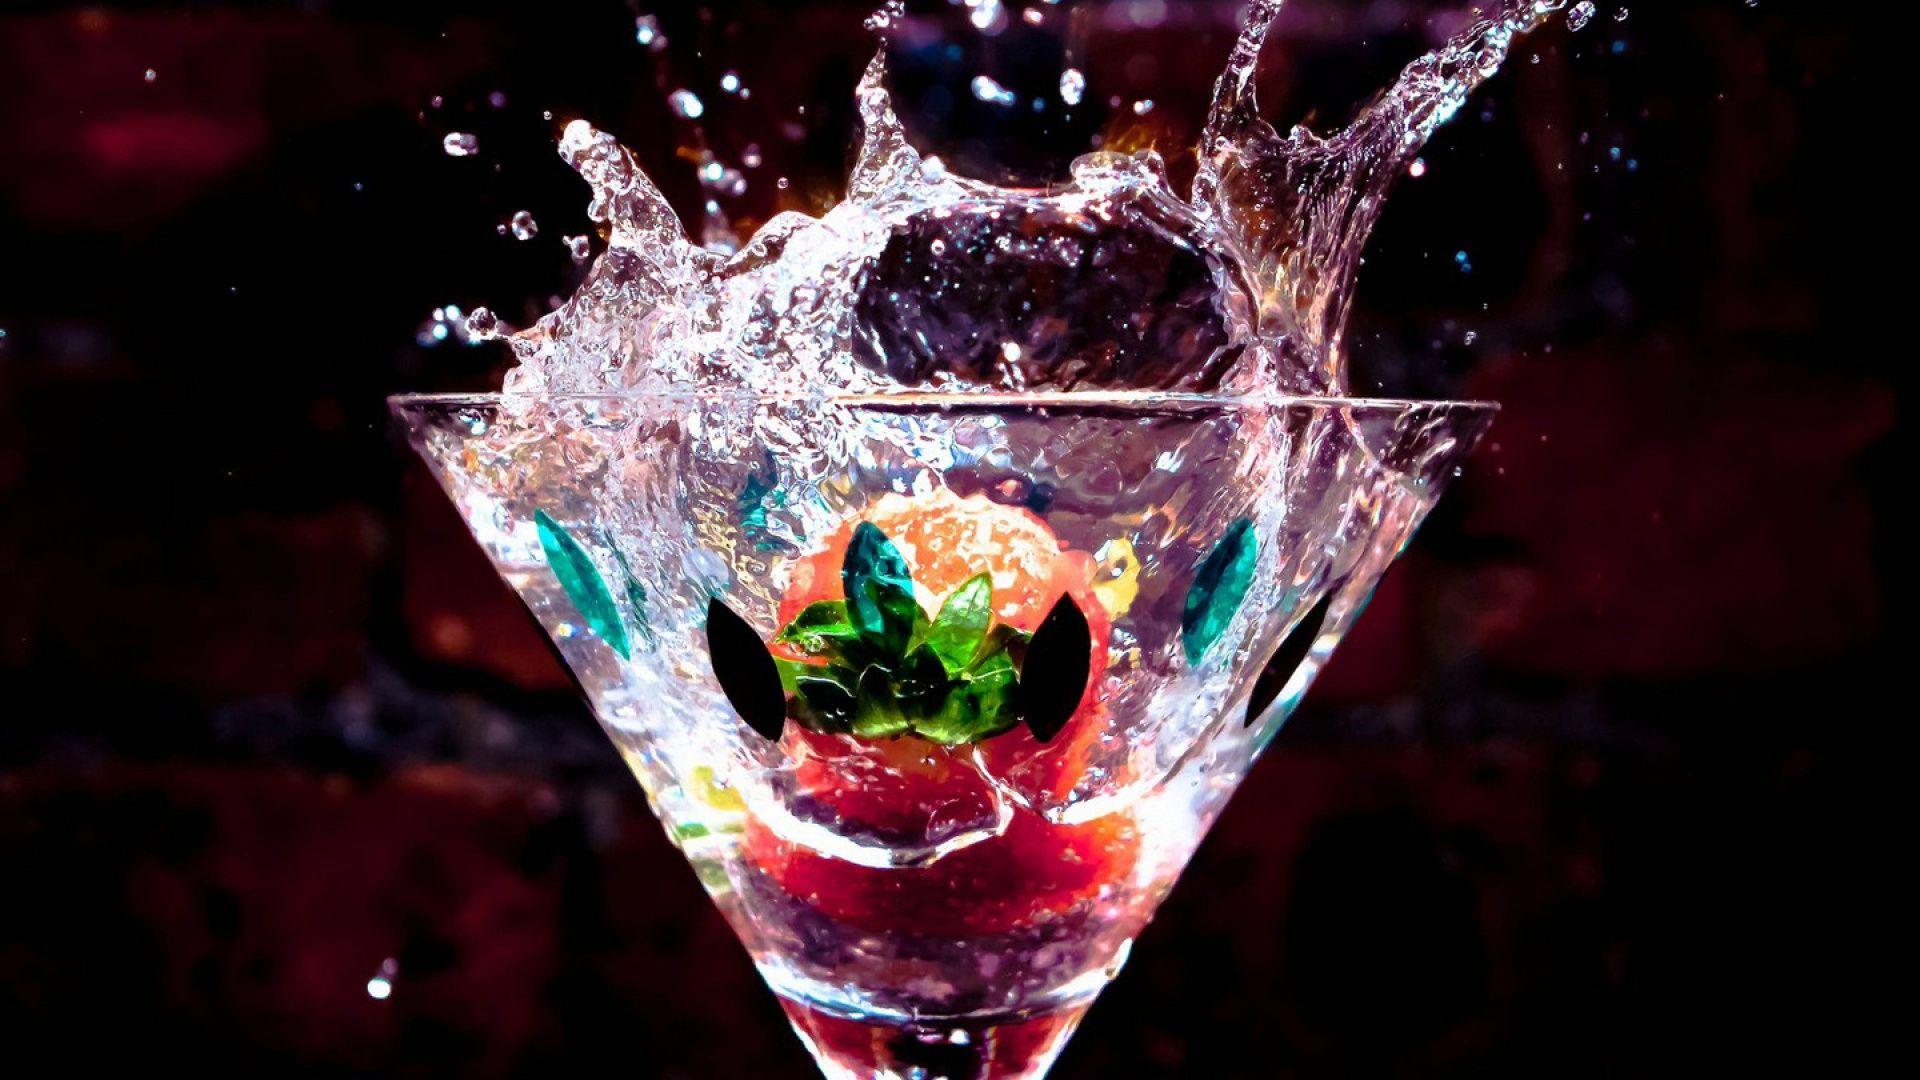 #Cocktails #Recipes #Poster #Attire